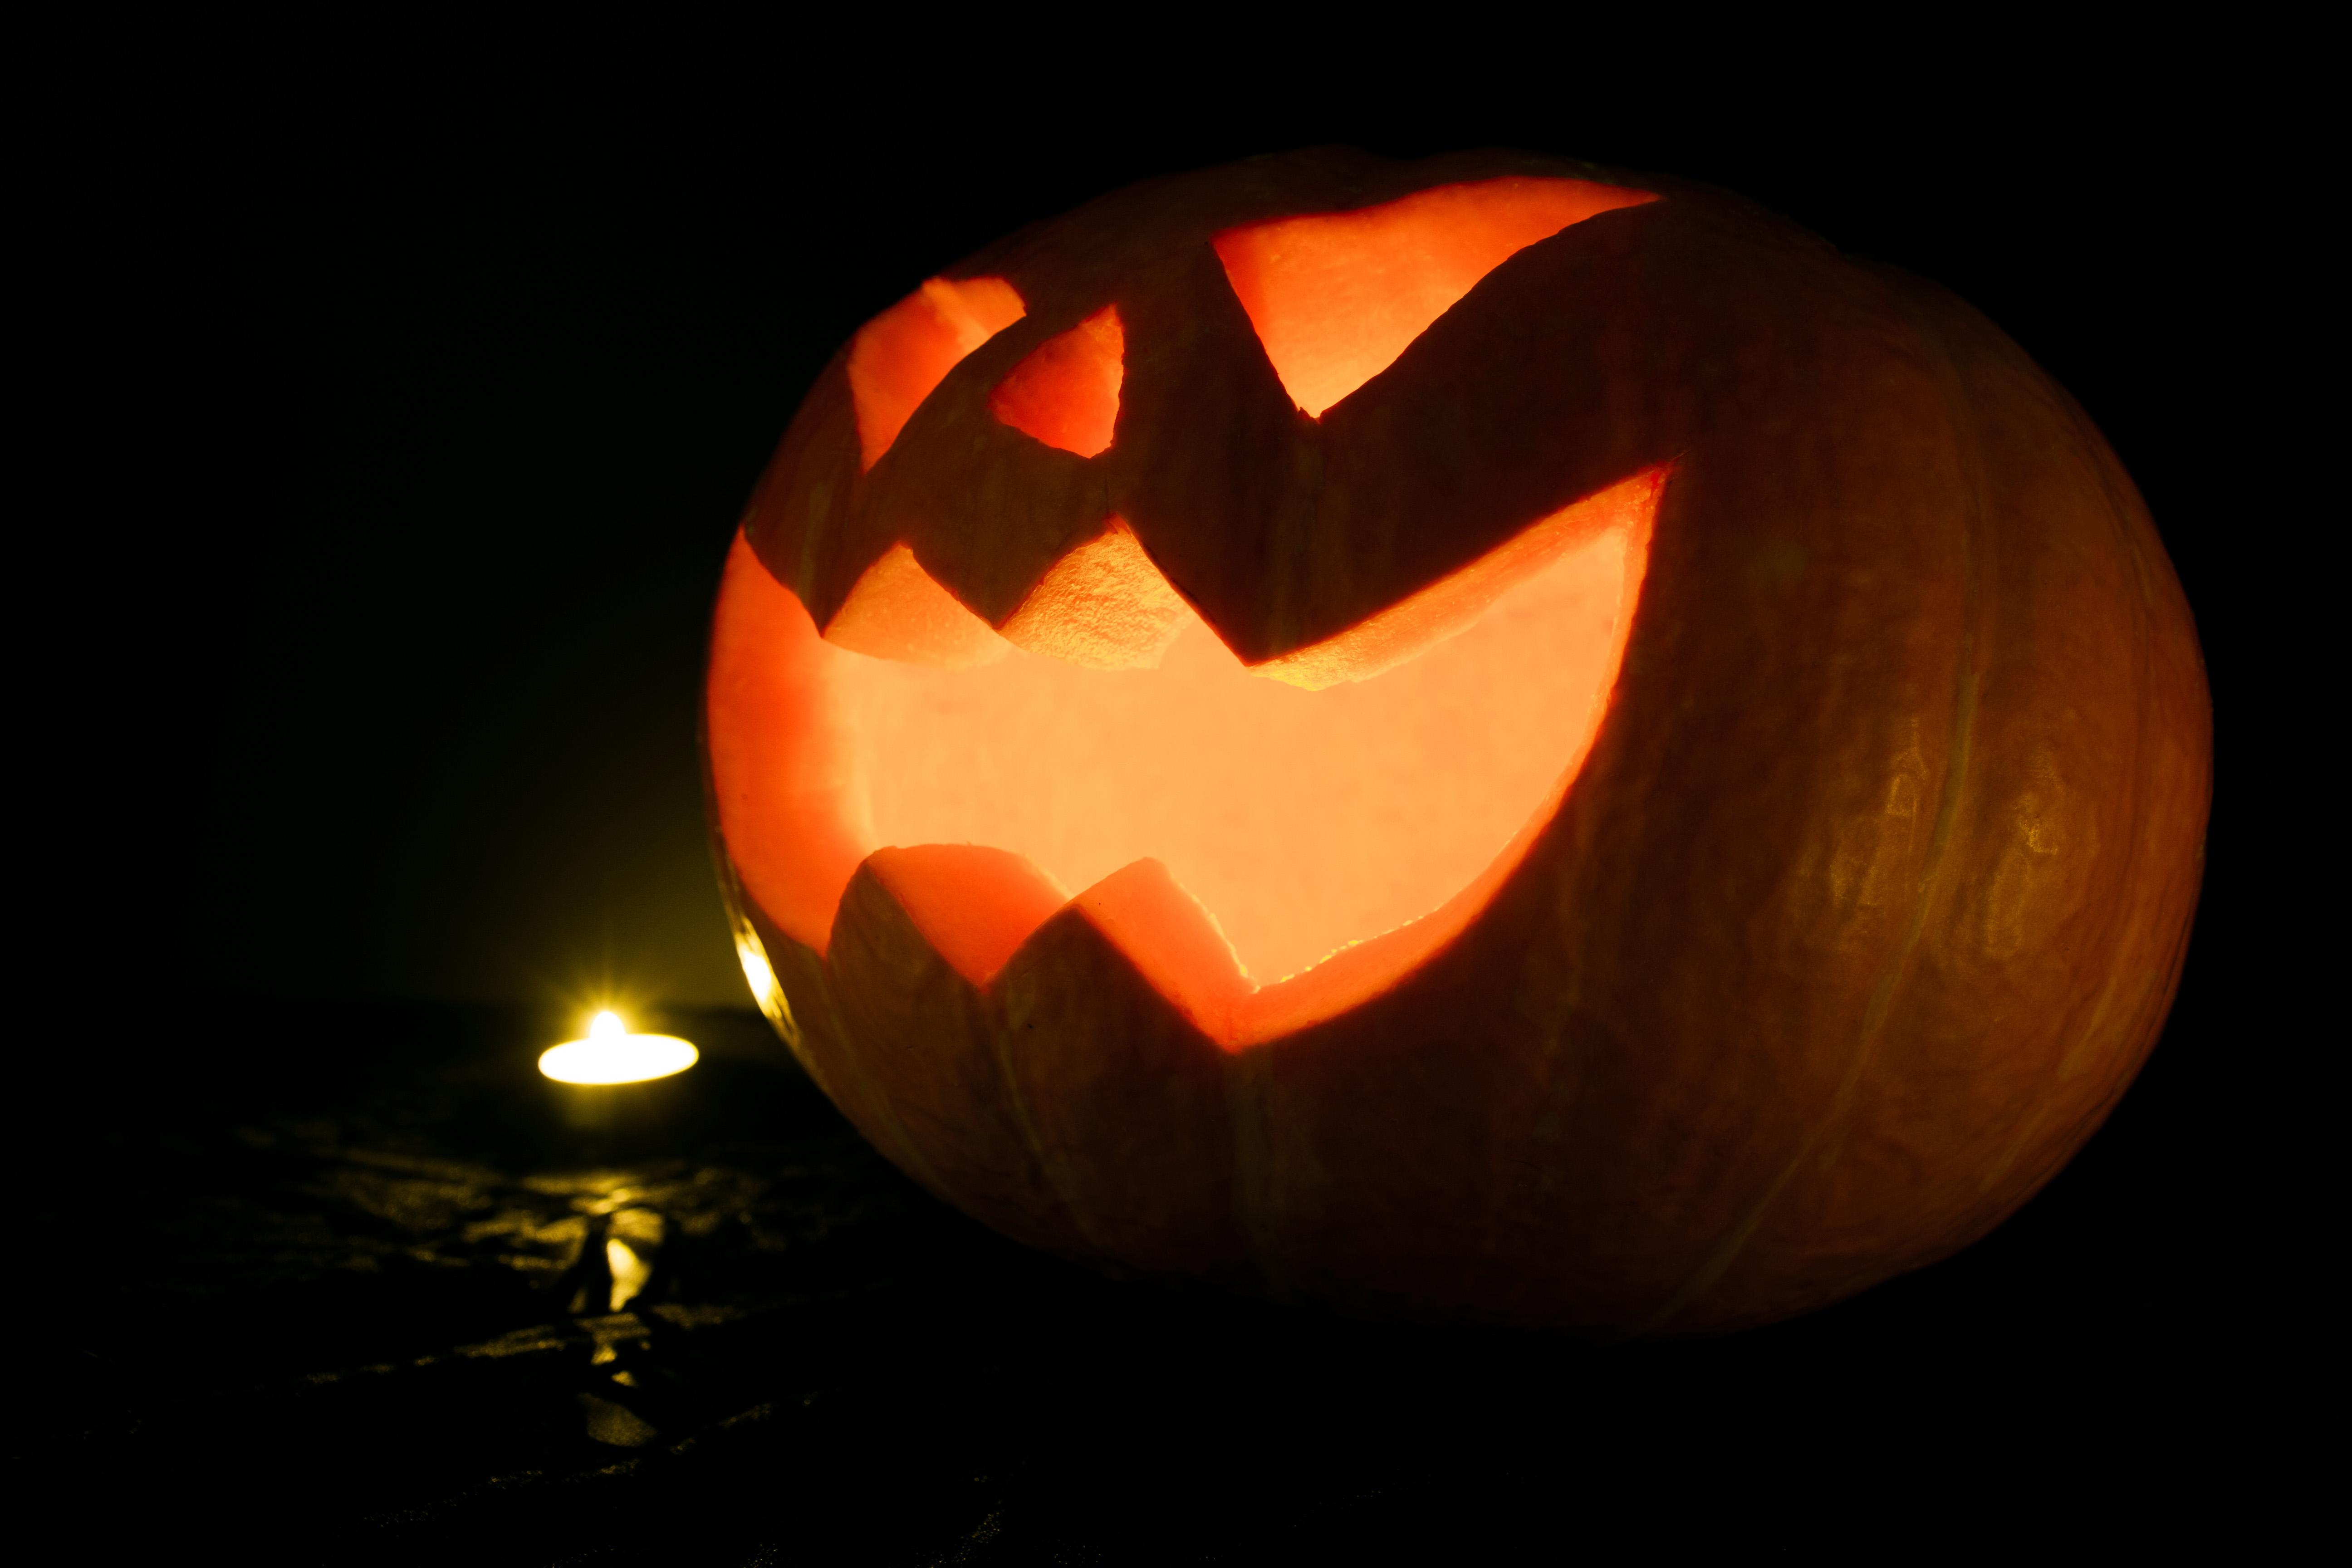 Night Fall Spooky Orange Produce Autumn Pumpkin Halloween Holiday Jack O  Lantern Scary Candles Holidays Seasonal